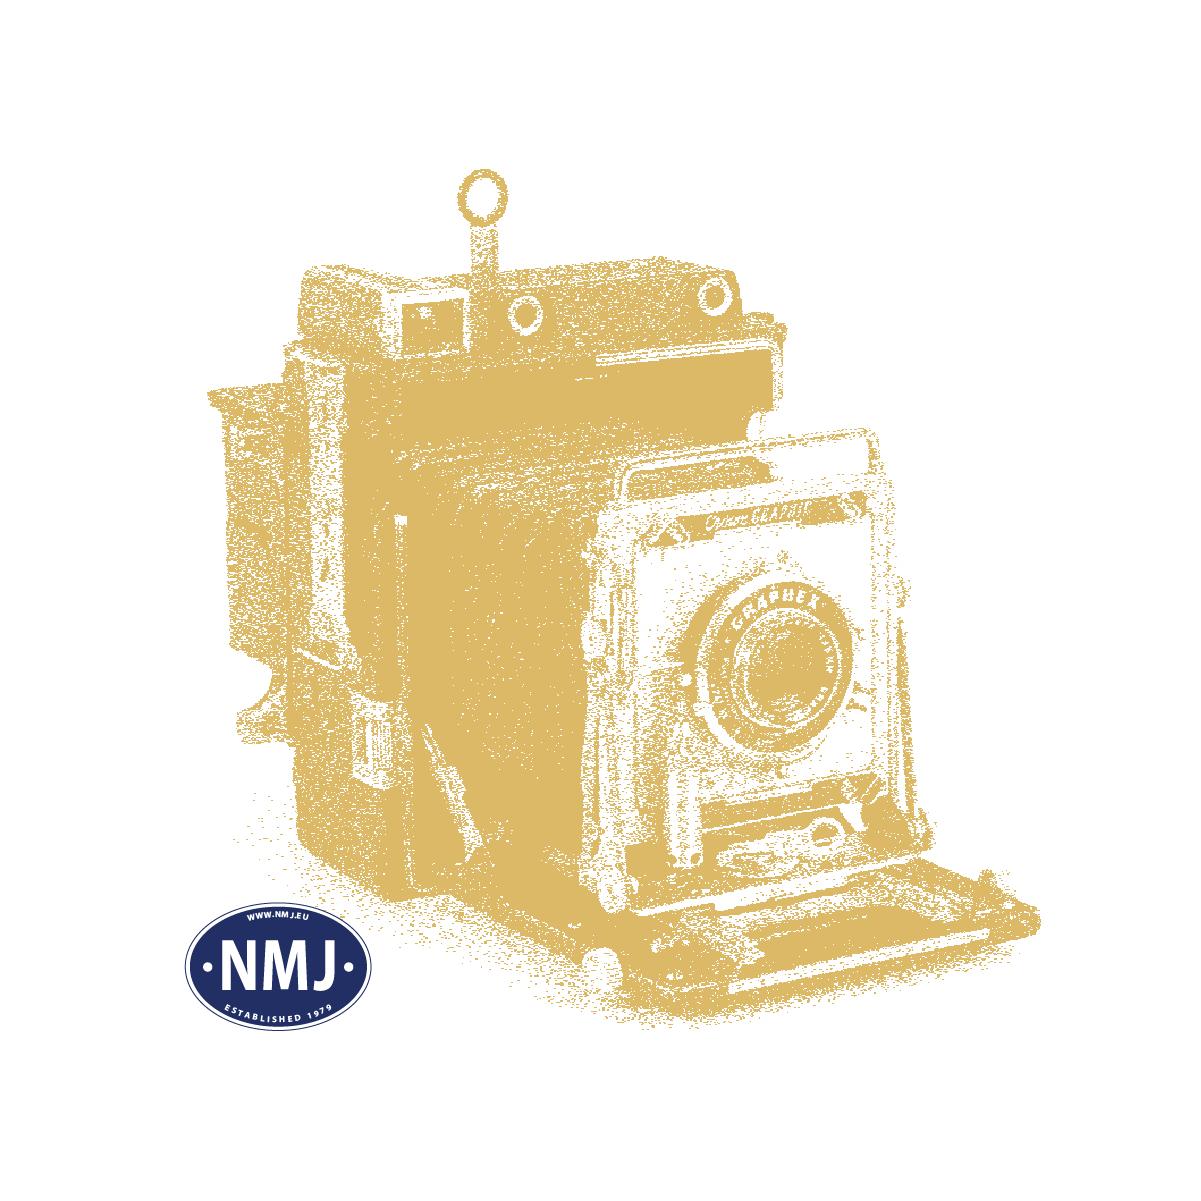 Topline Lokomotiver, nmj-topline-90212-mav-m61-019-classic-dc-nmjt, NMJT90212